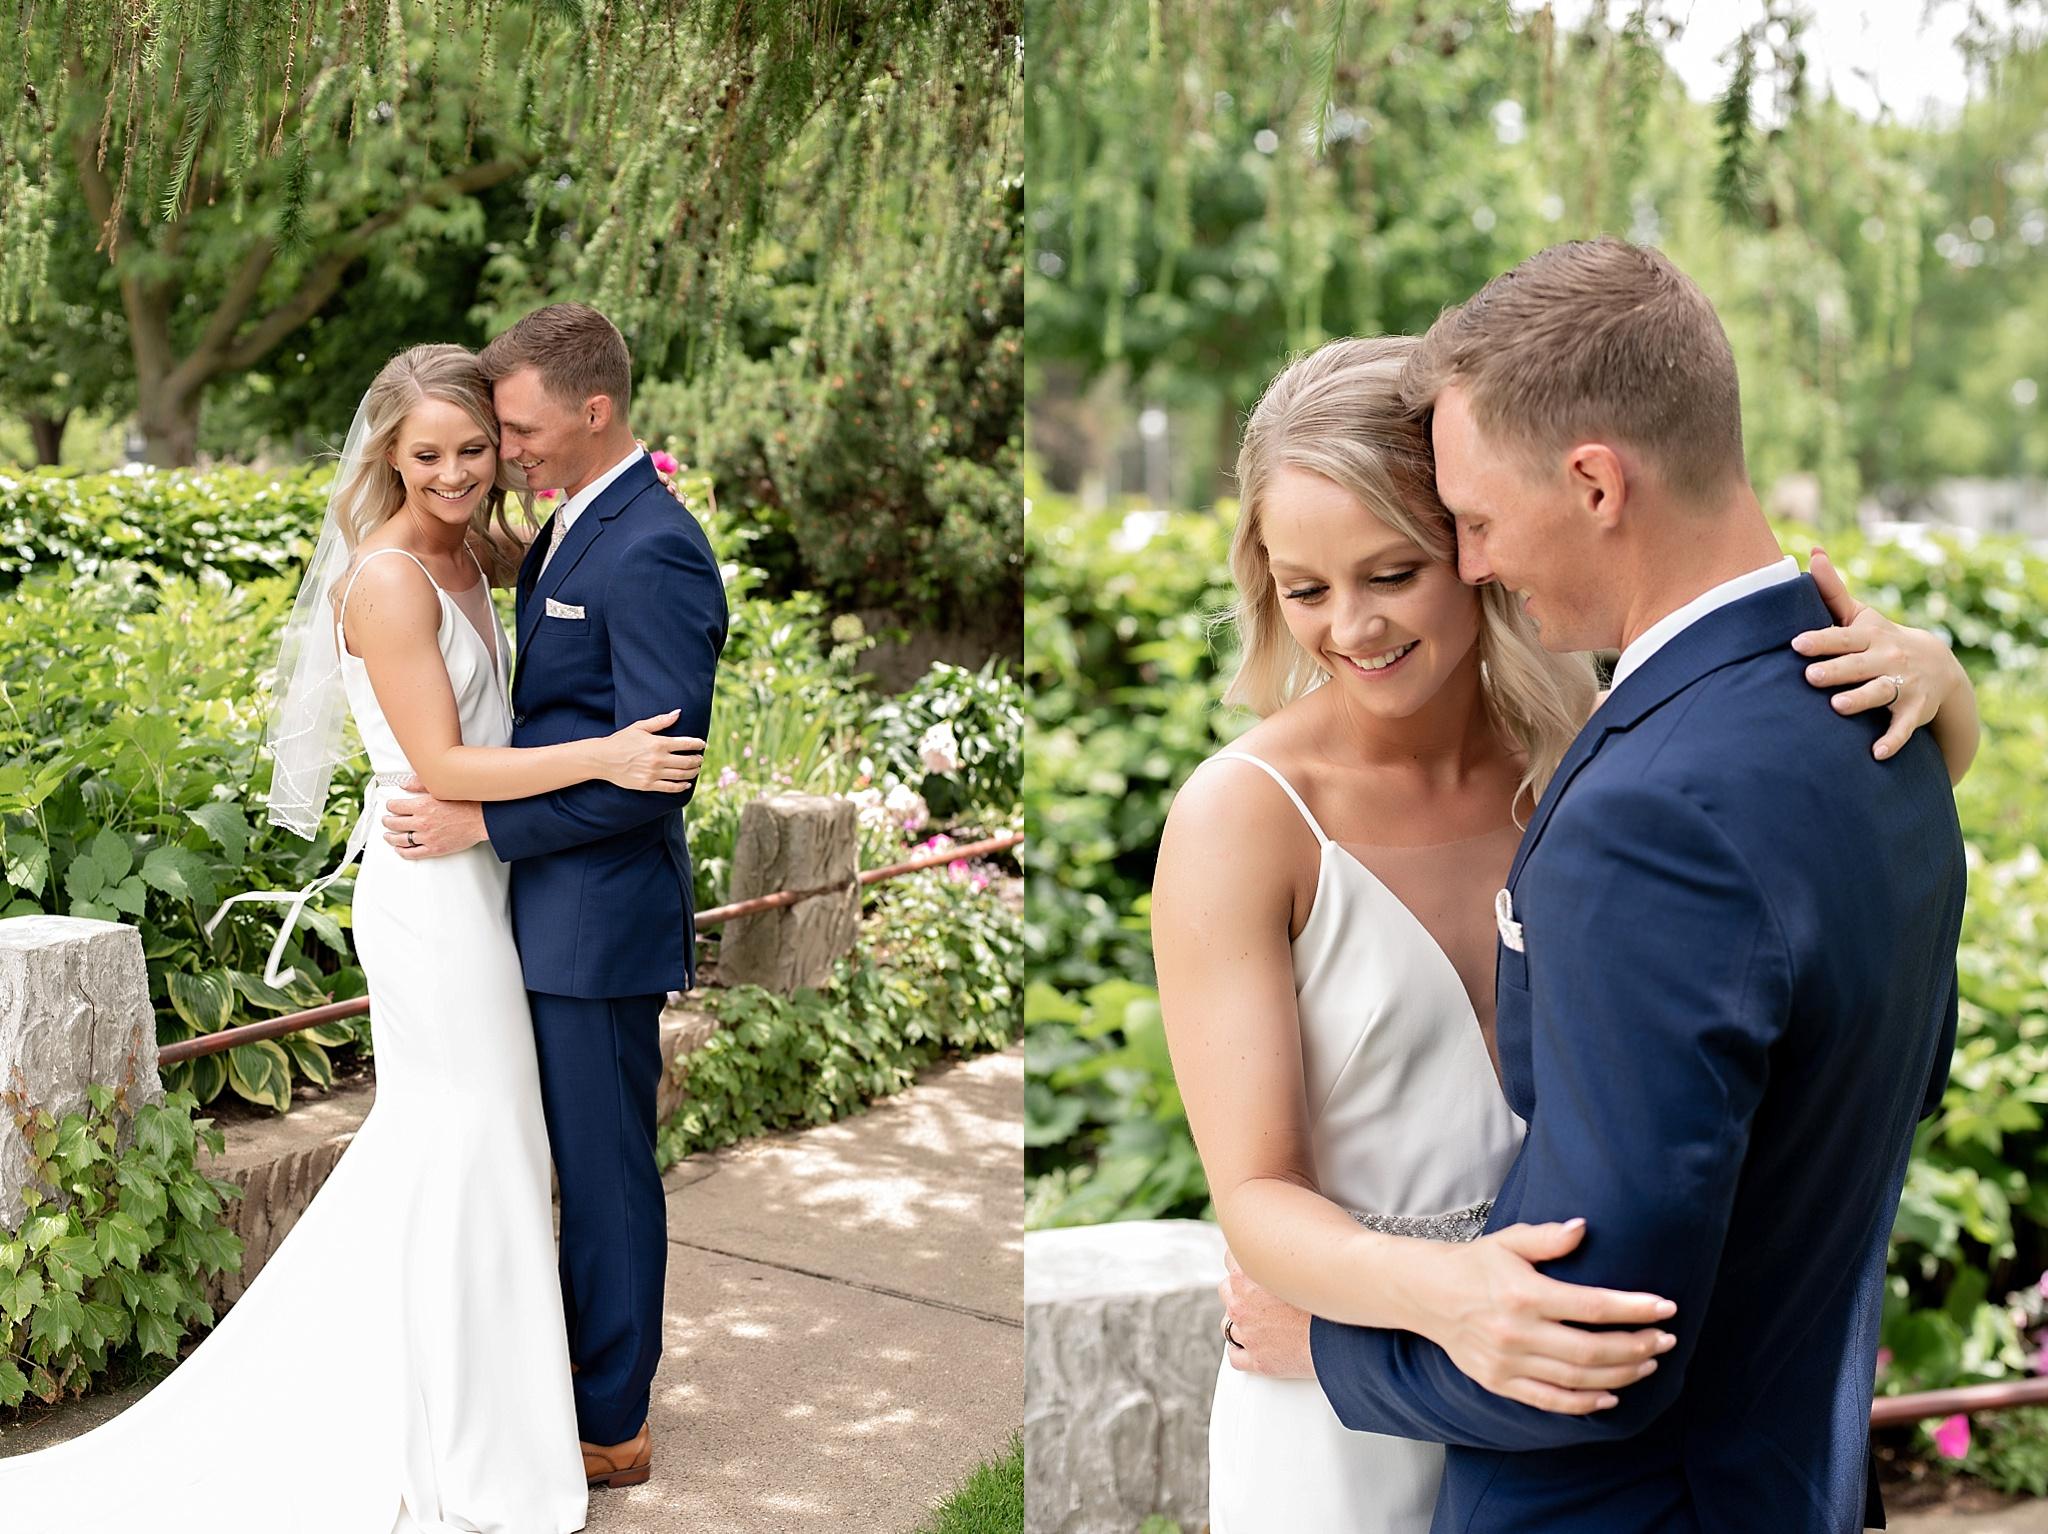 bride and groom portraits sioux falls sd kate jones studios mckennan park